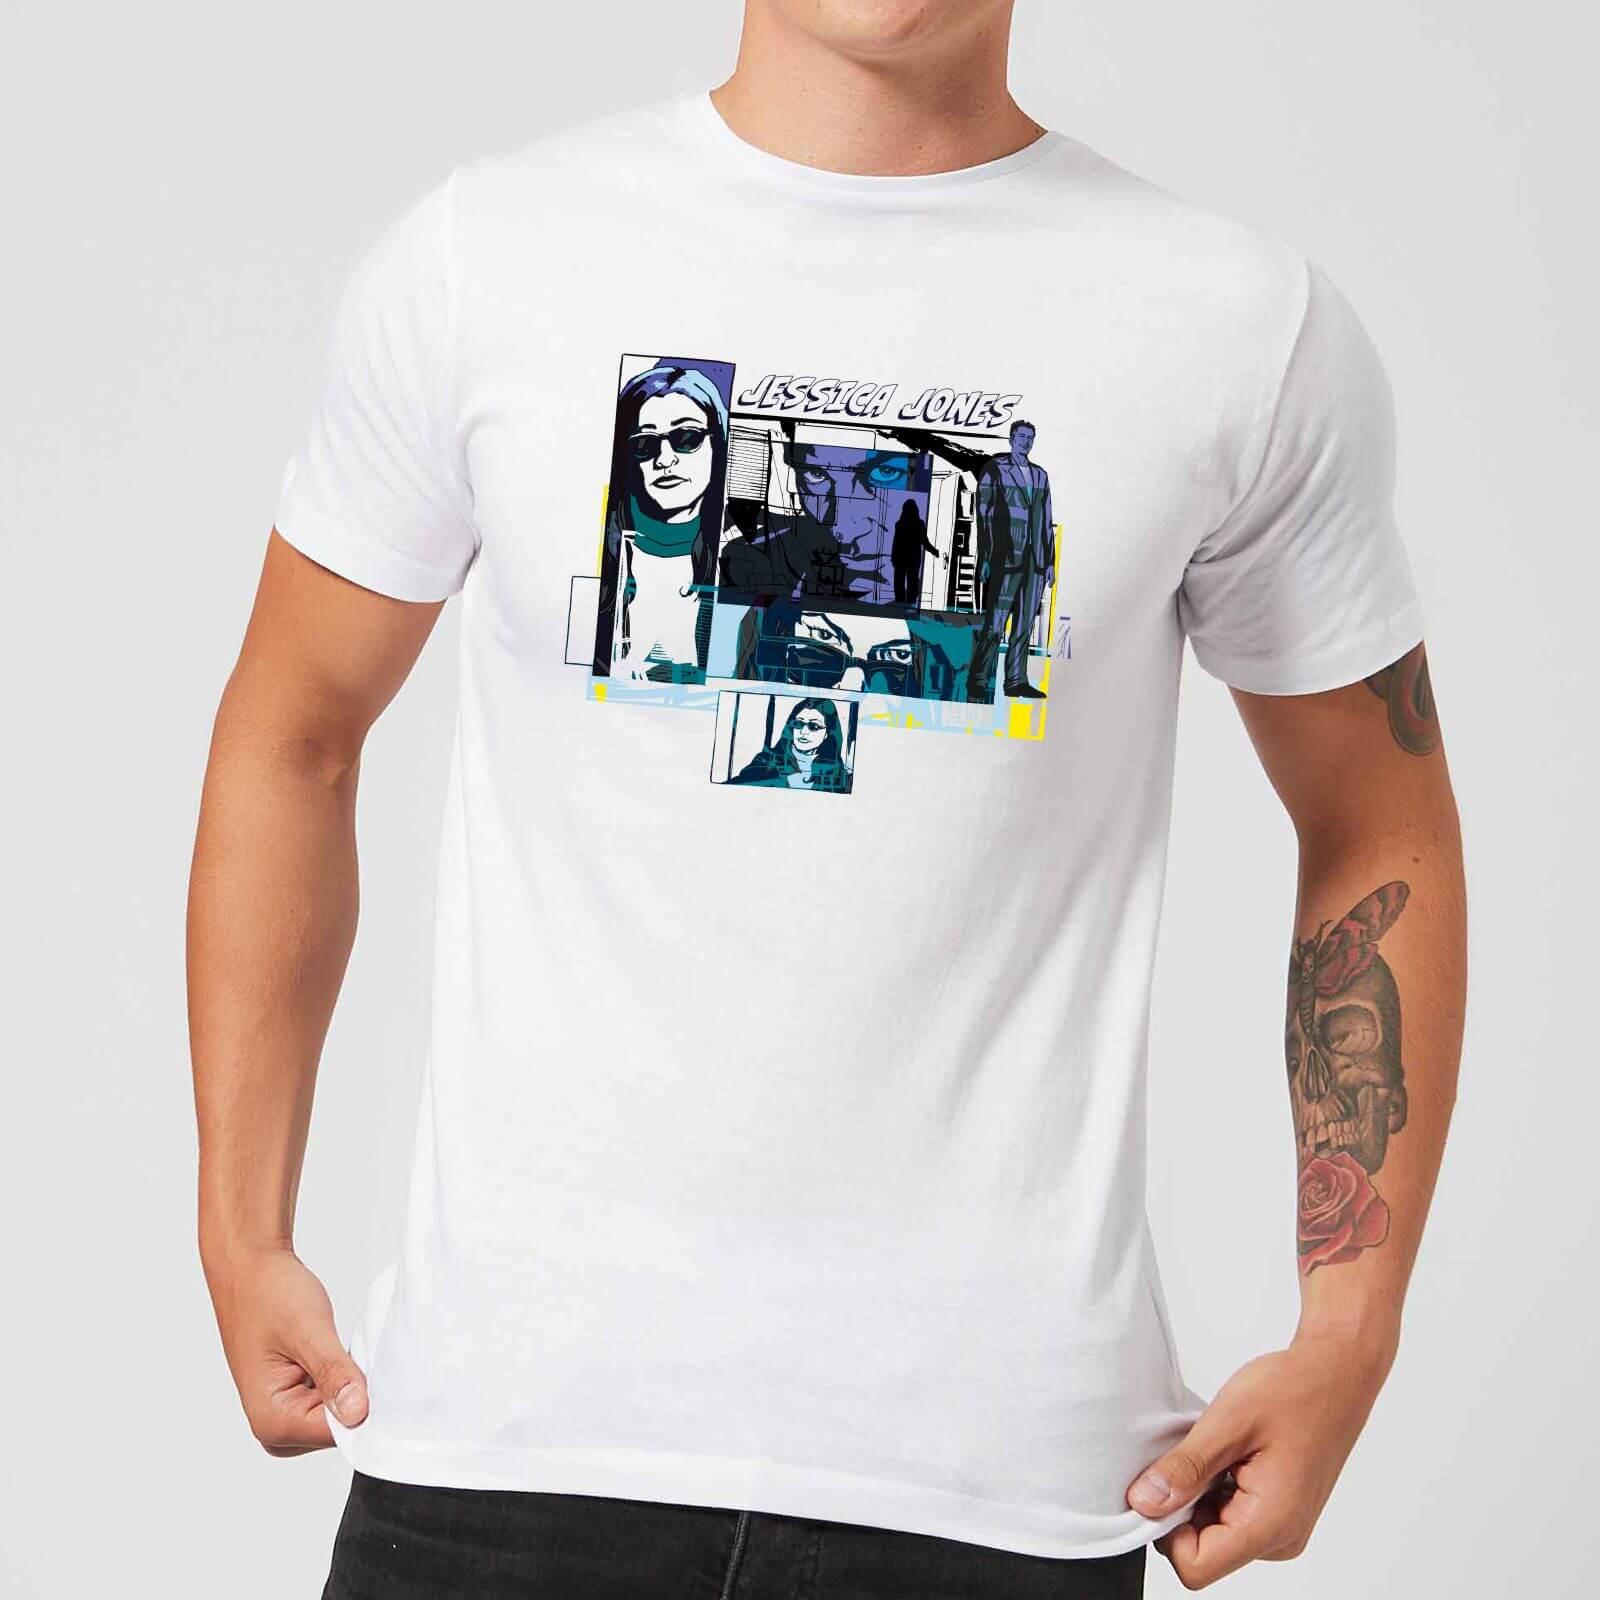 OfferteWeb.click 46-t-shirt-marvel-knights-jessica-jones-comic-panels-bianco